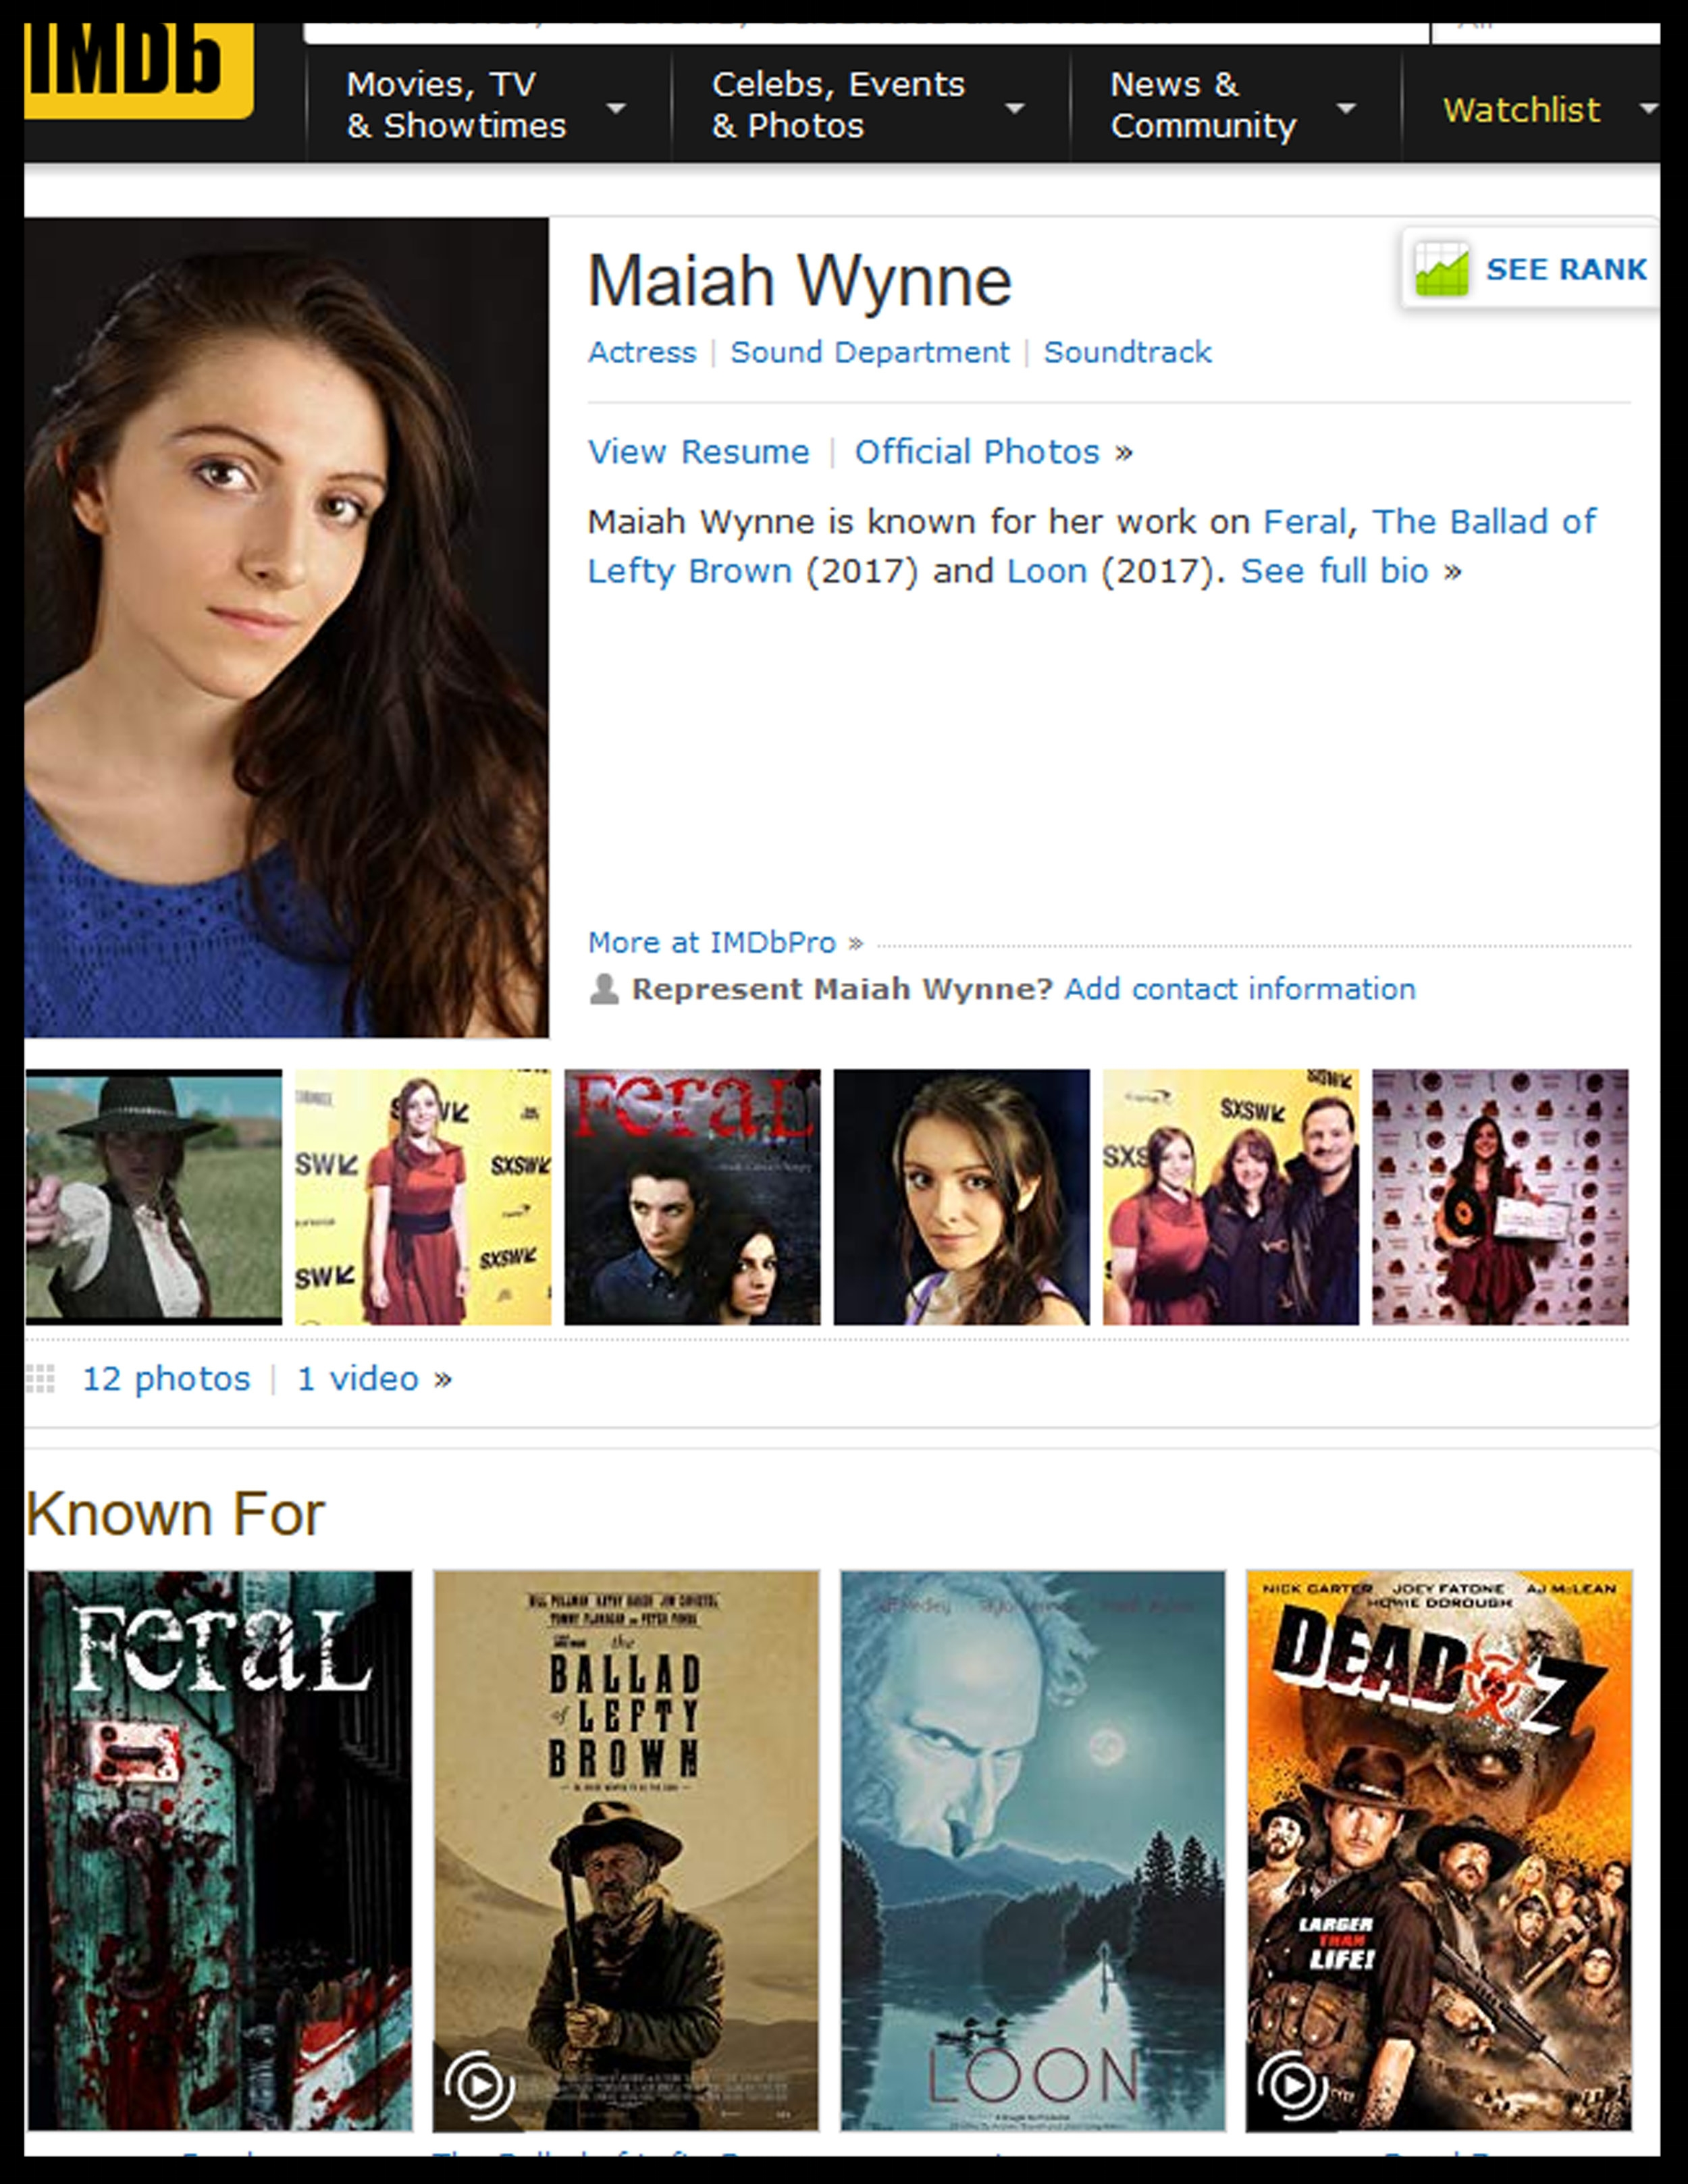 IMDBwebsite.jpg